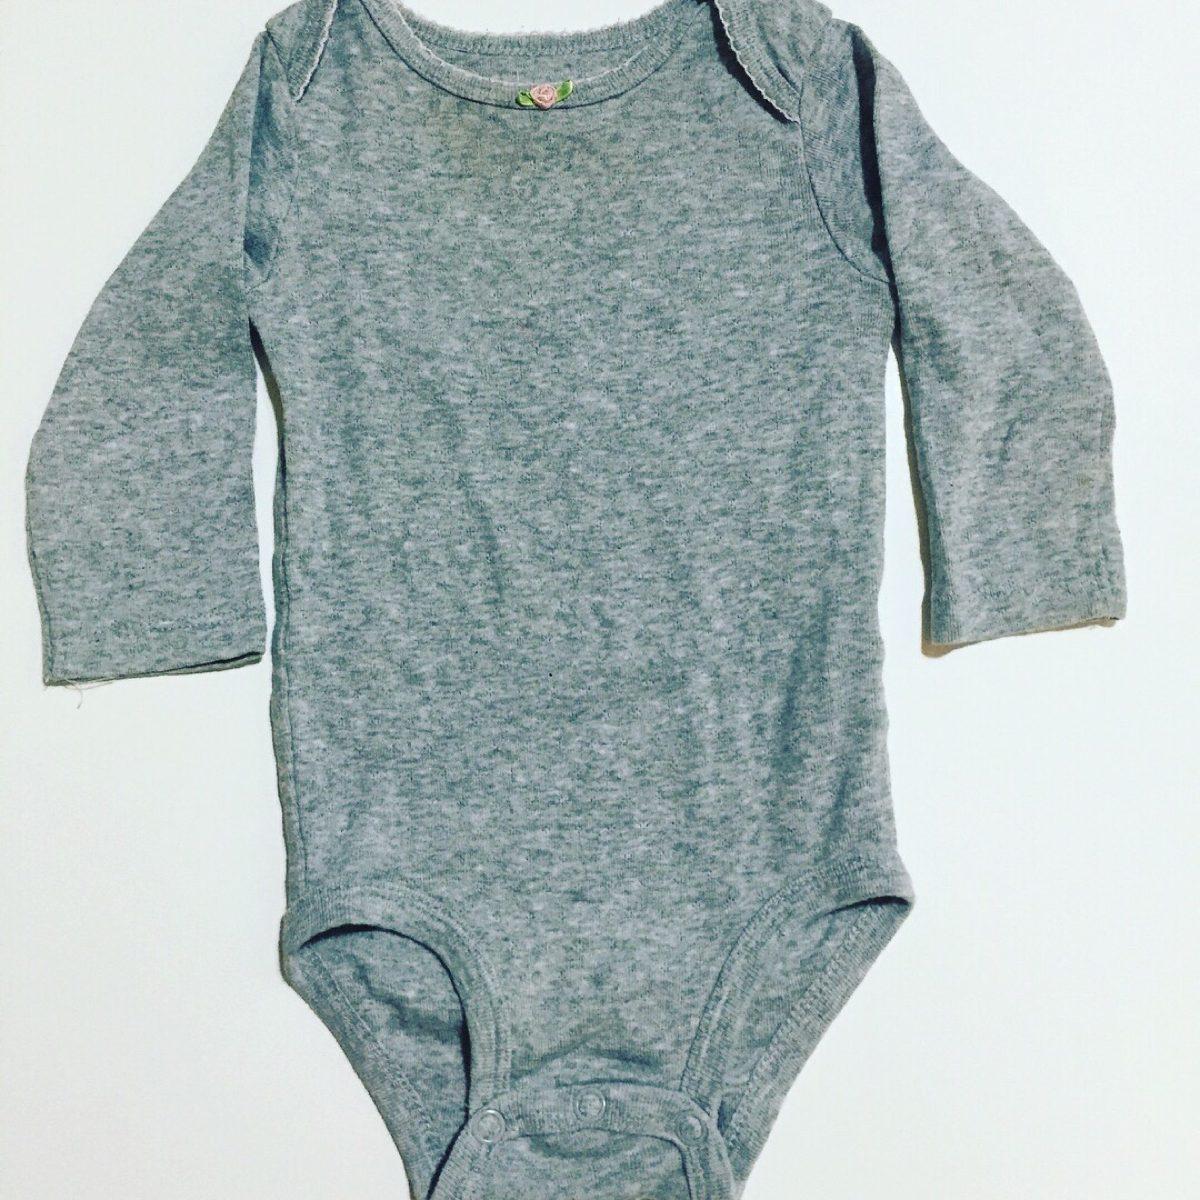 body carters usado remate bebe ropa oferta 6 meses. Cargando zoom. 2f5f7d6df7f7